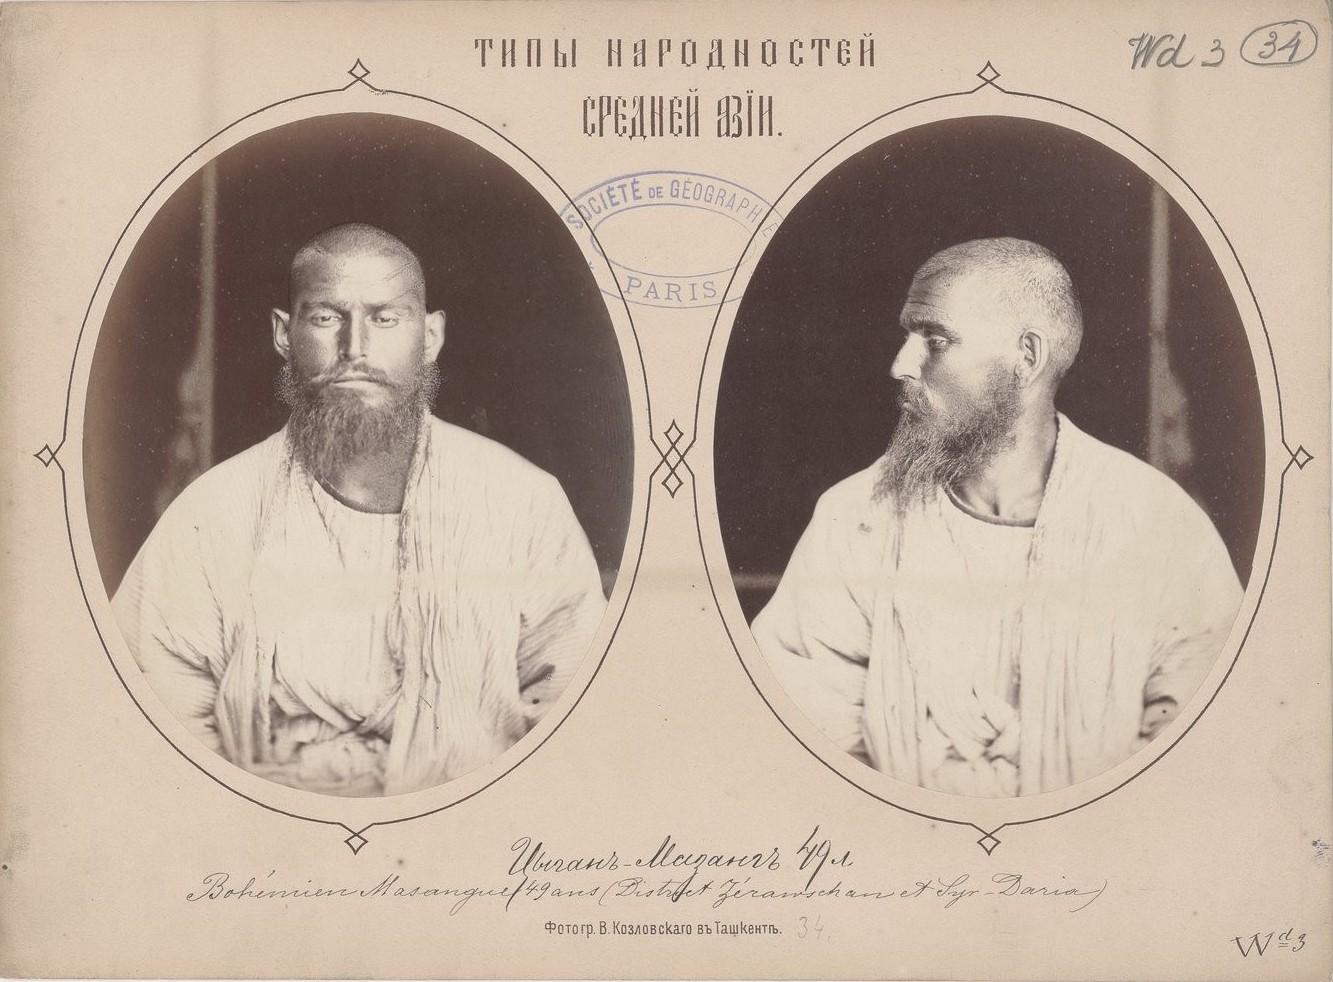 Цыган-мазанг, 49 лет. Зеравшанский округ